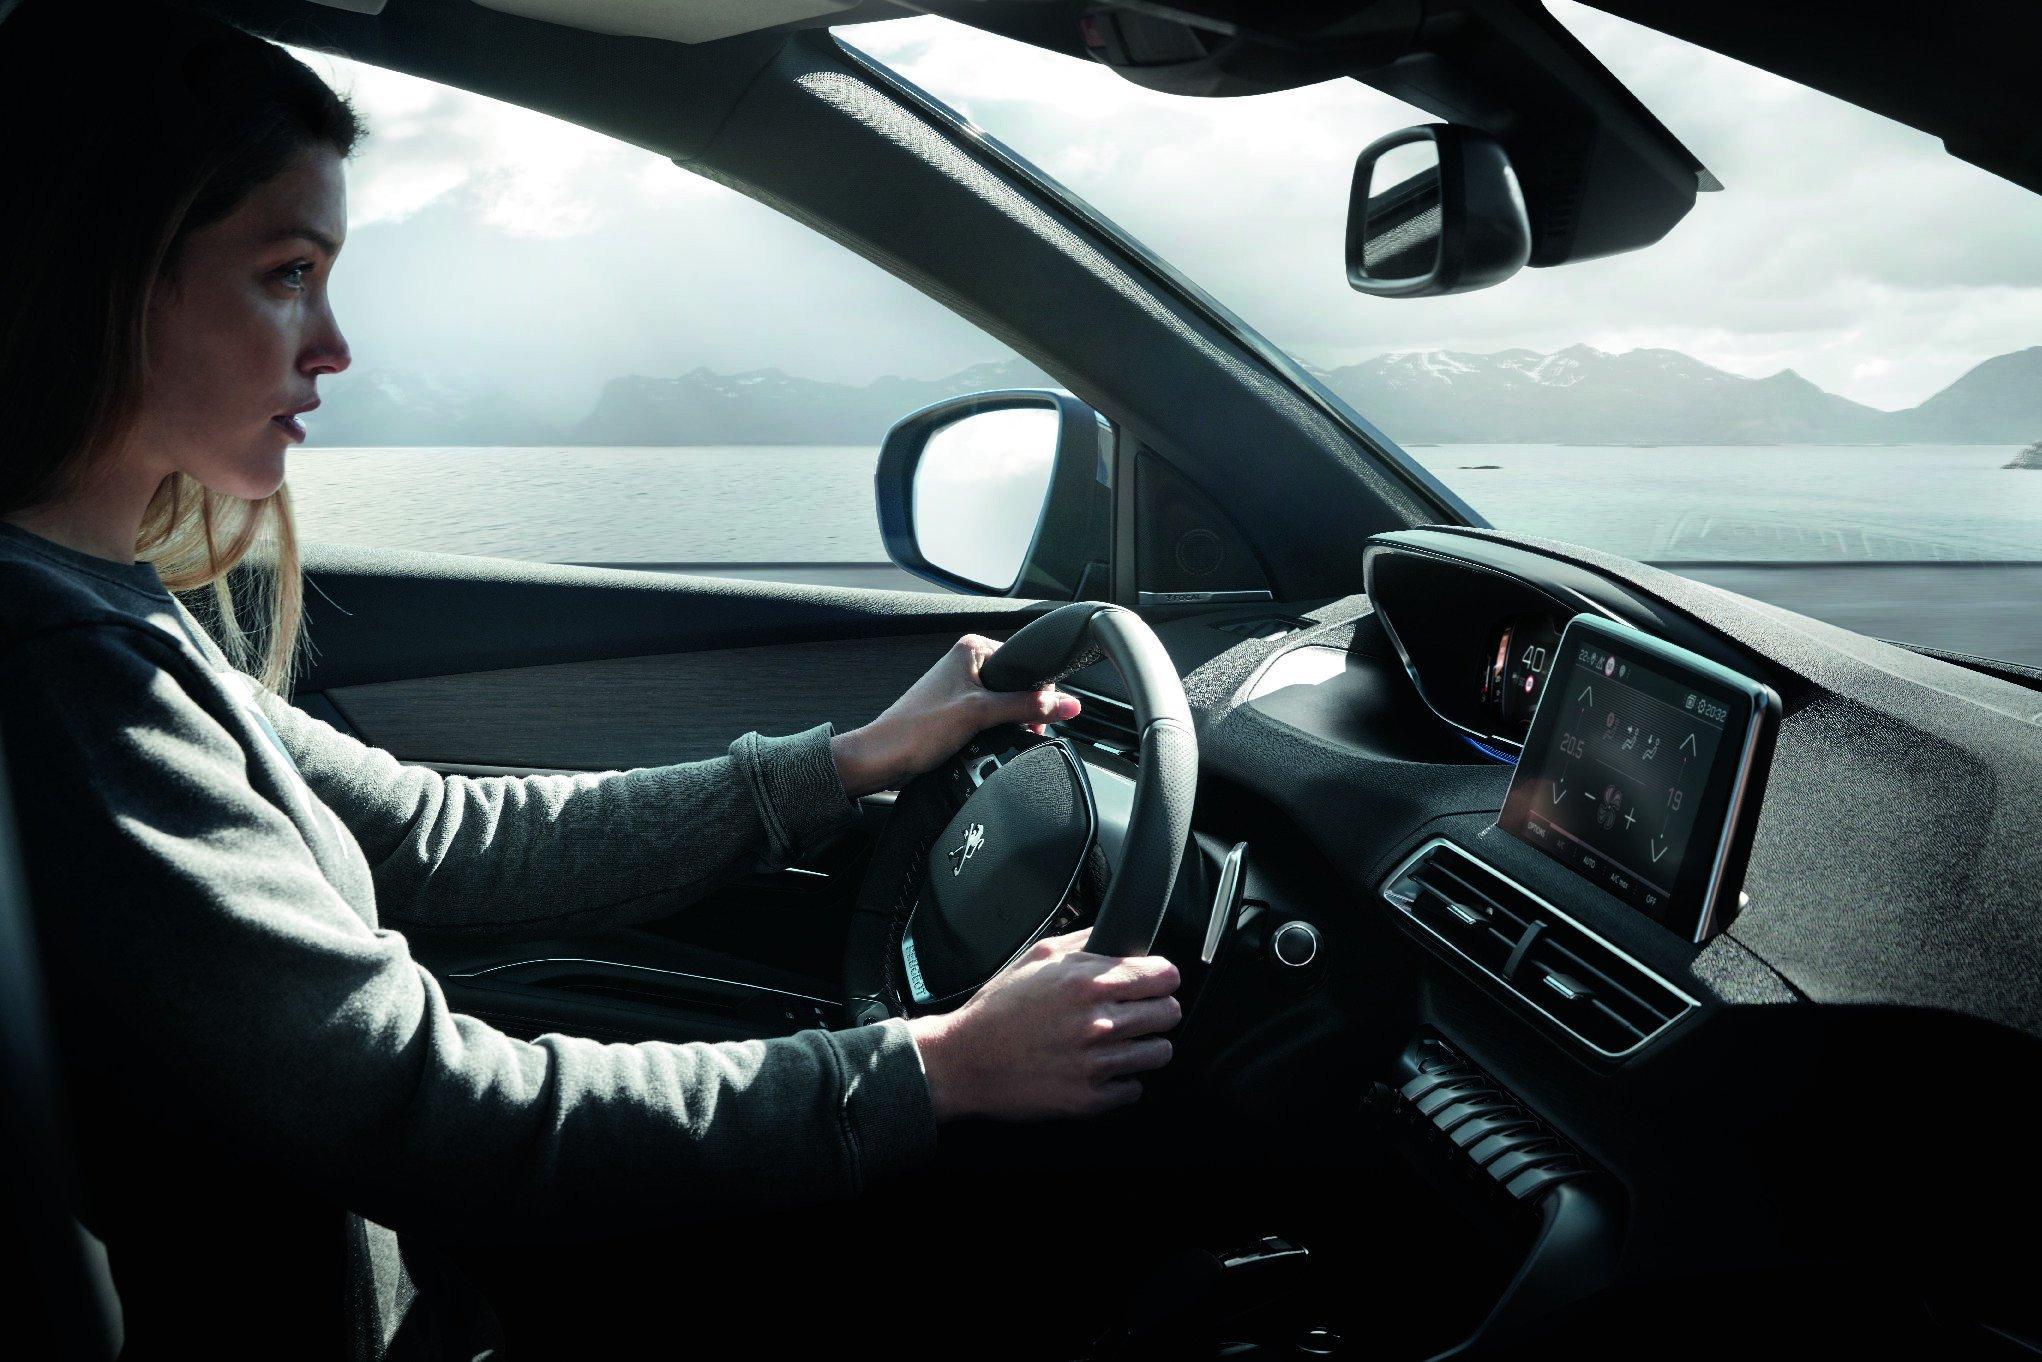 peugeot 3008 personaliza el olor de tu coche con el i cockpit amplify. Black Bedroom Furniture Sets. Home Design Ideas